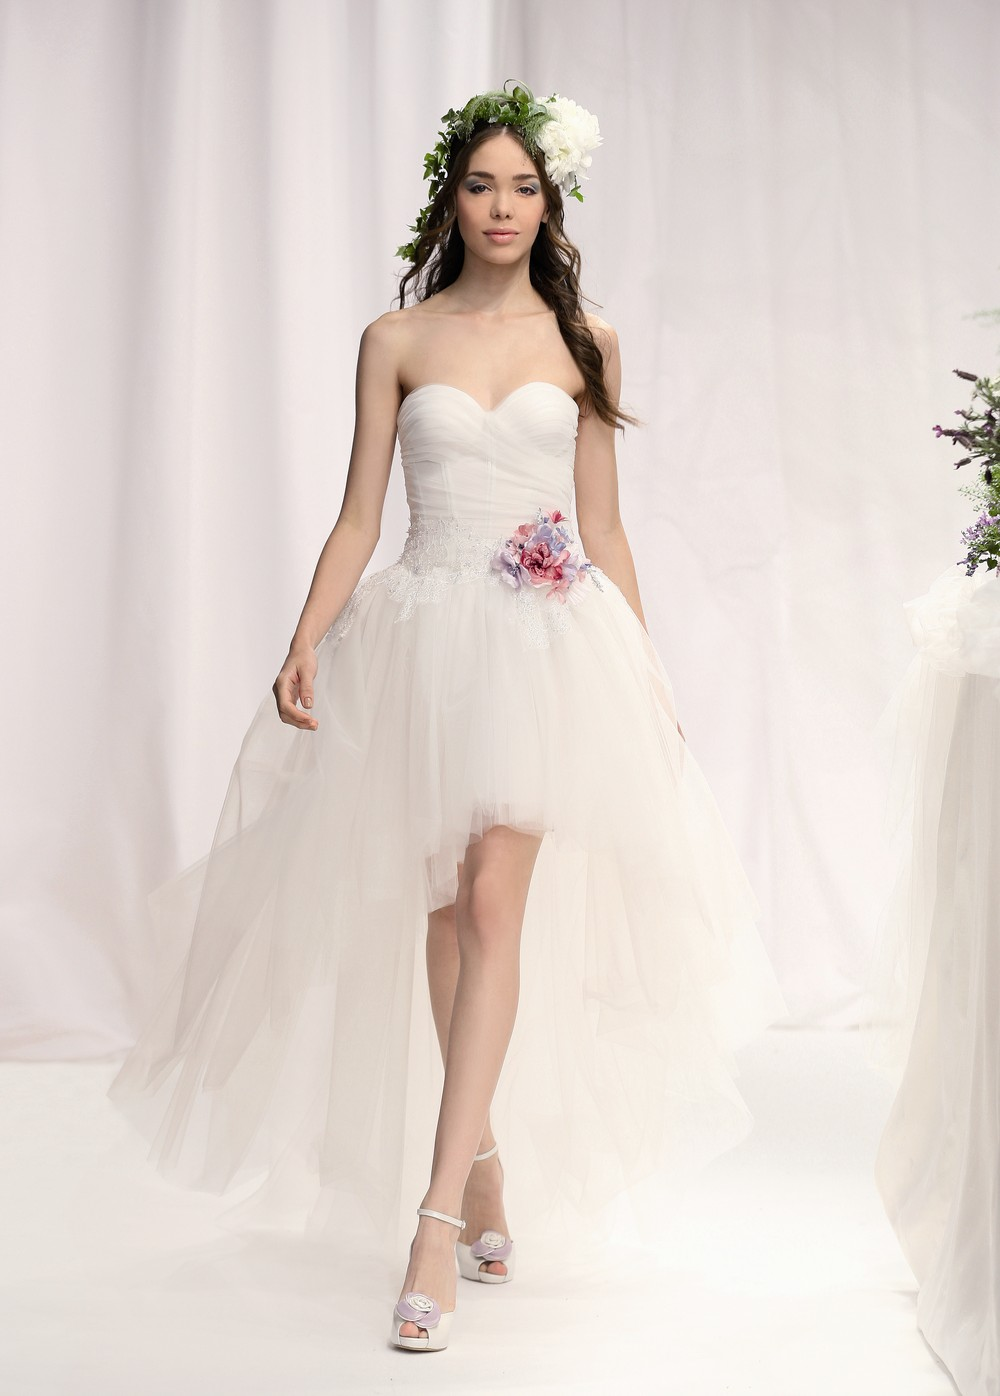 most beautiful wedding dresses 2012 bridal wears. Black Bedroom Furniture Sets. Home Design Ideas